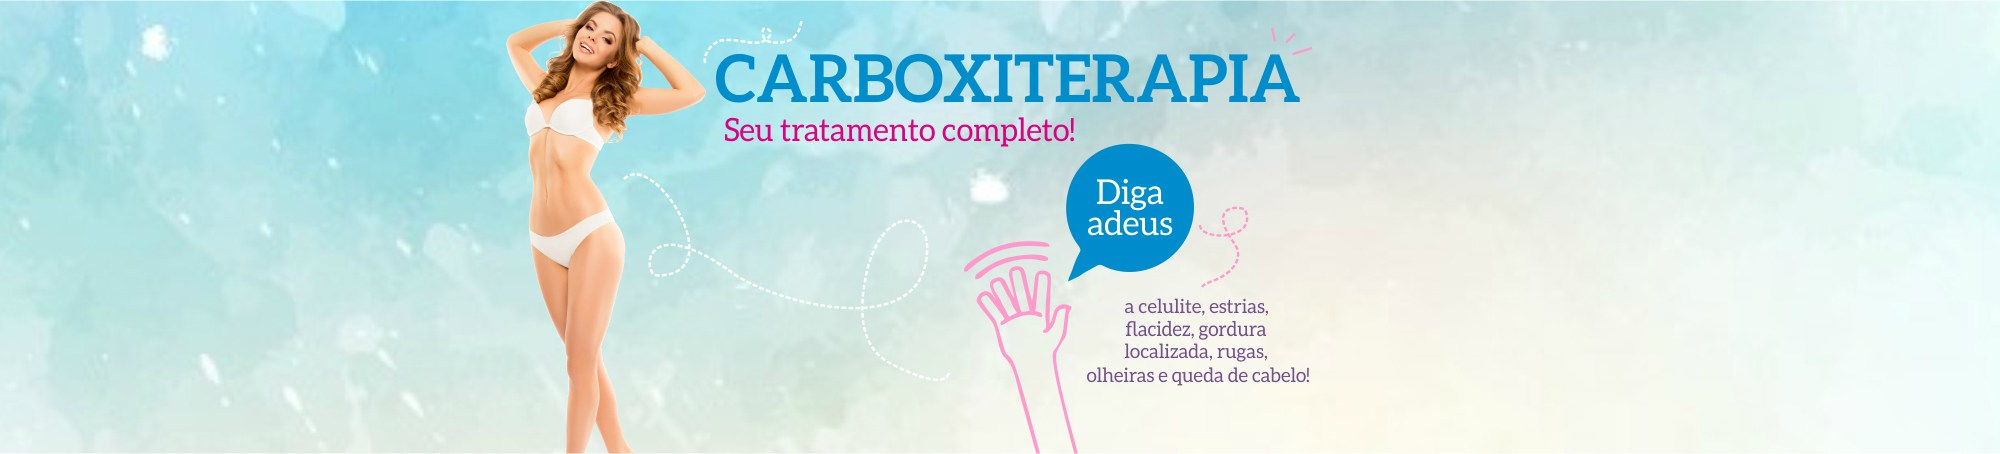 Carboxiterapia-Fisest-site